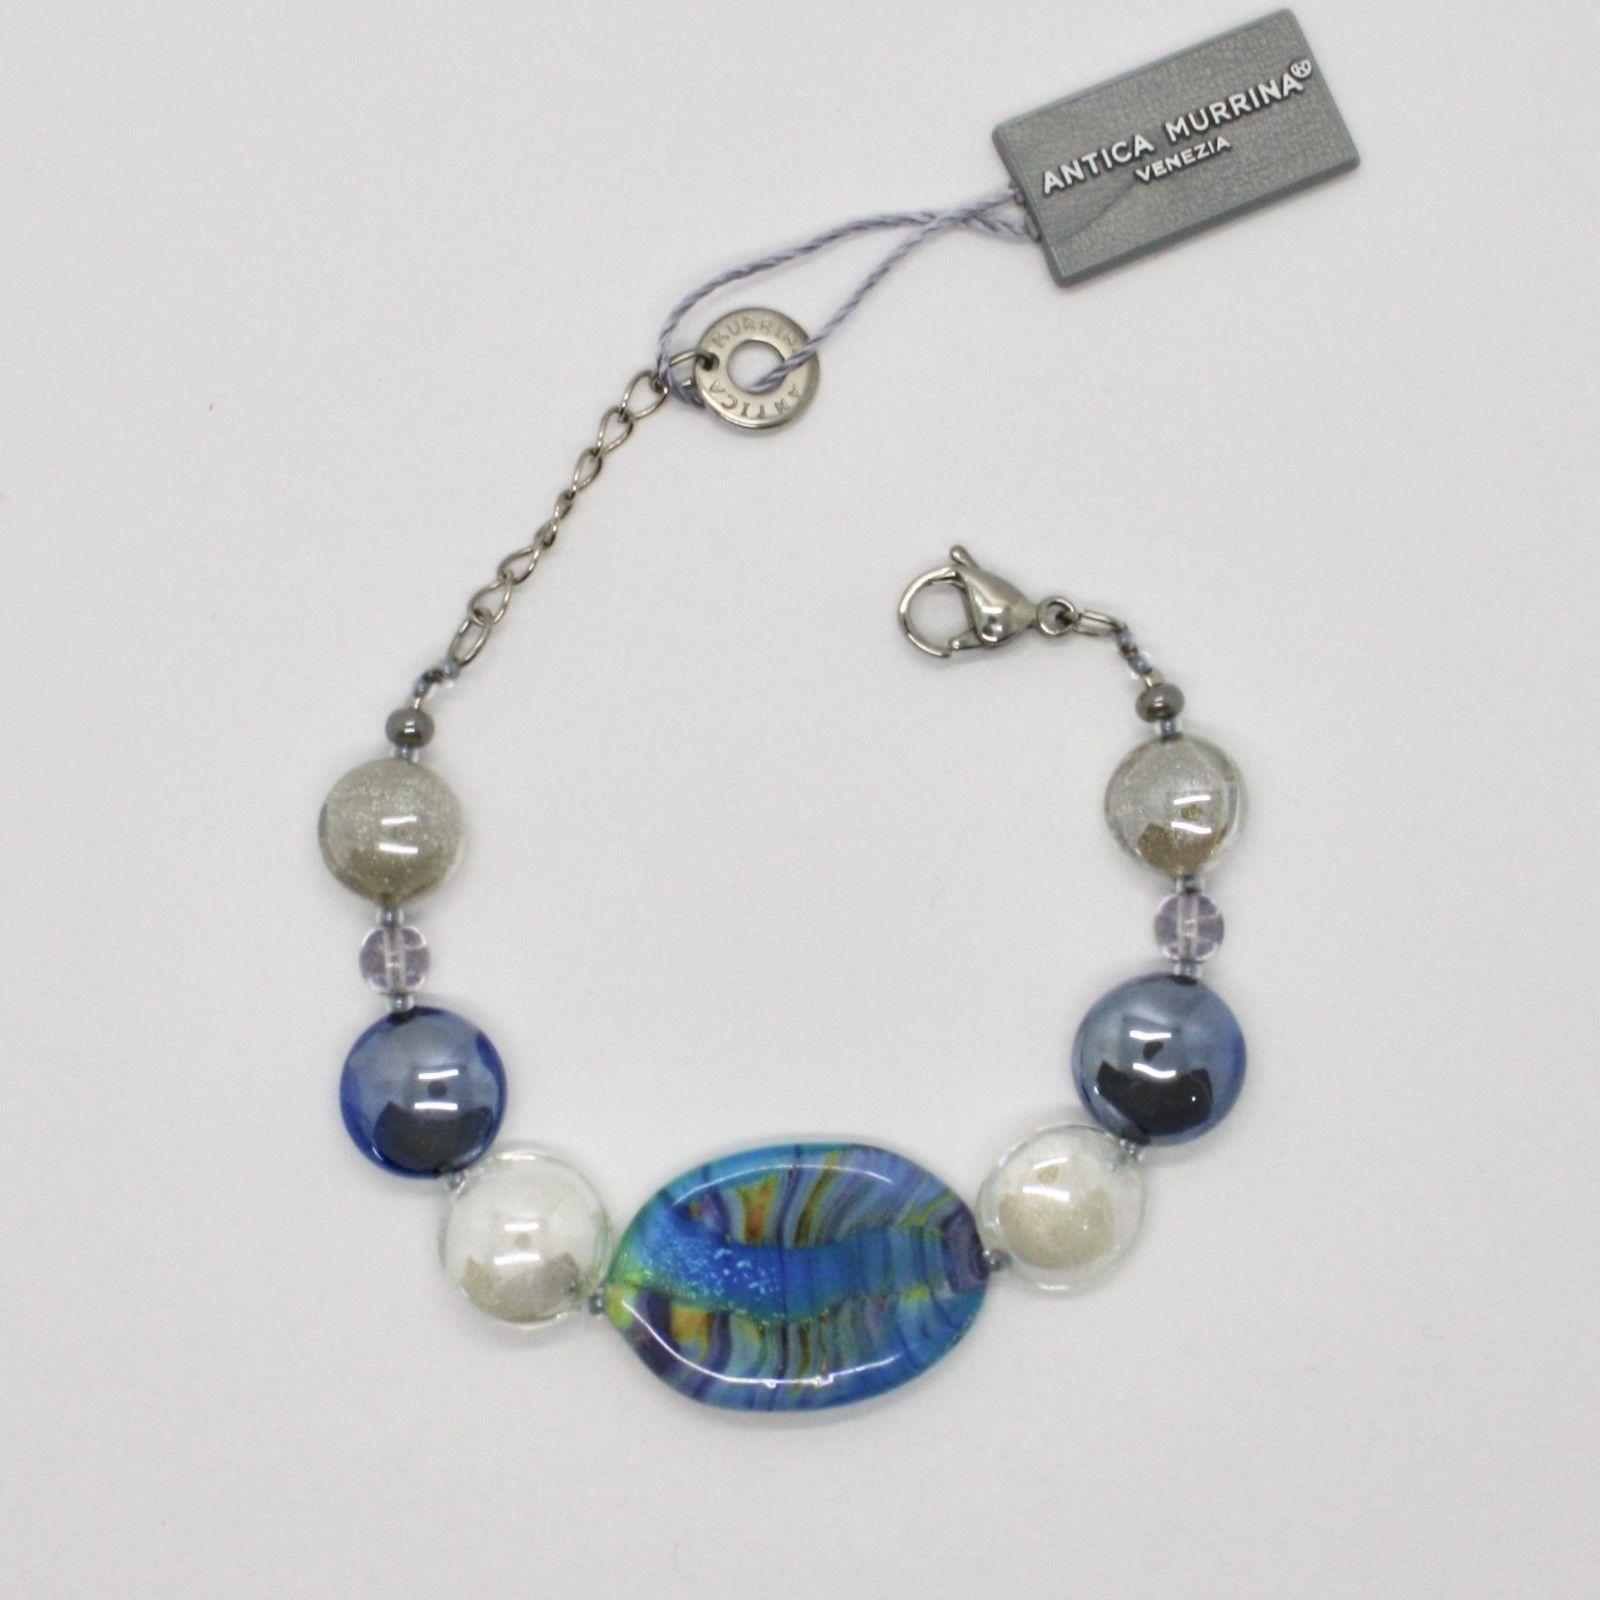 ANTICA MURRINA VENEZIA BRACELET WITH MURANO GLASS BLUE BEIGE WHITE BR794A07